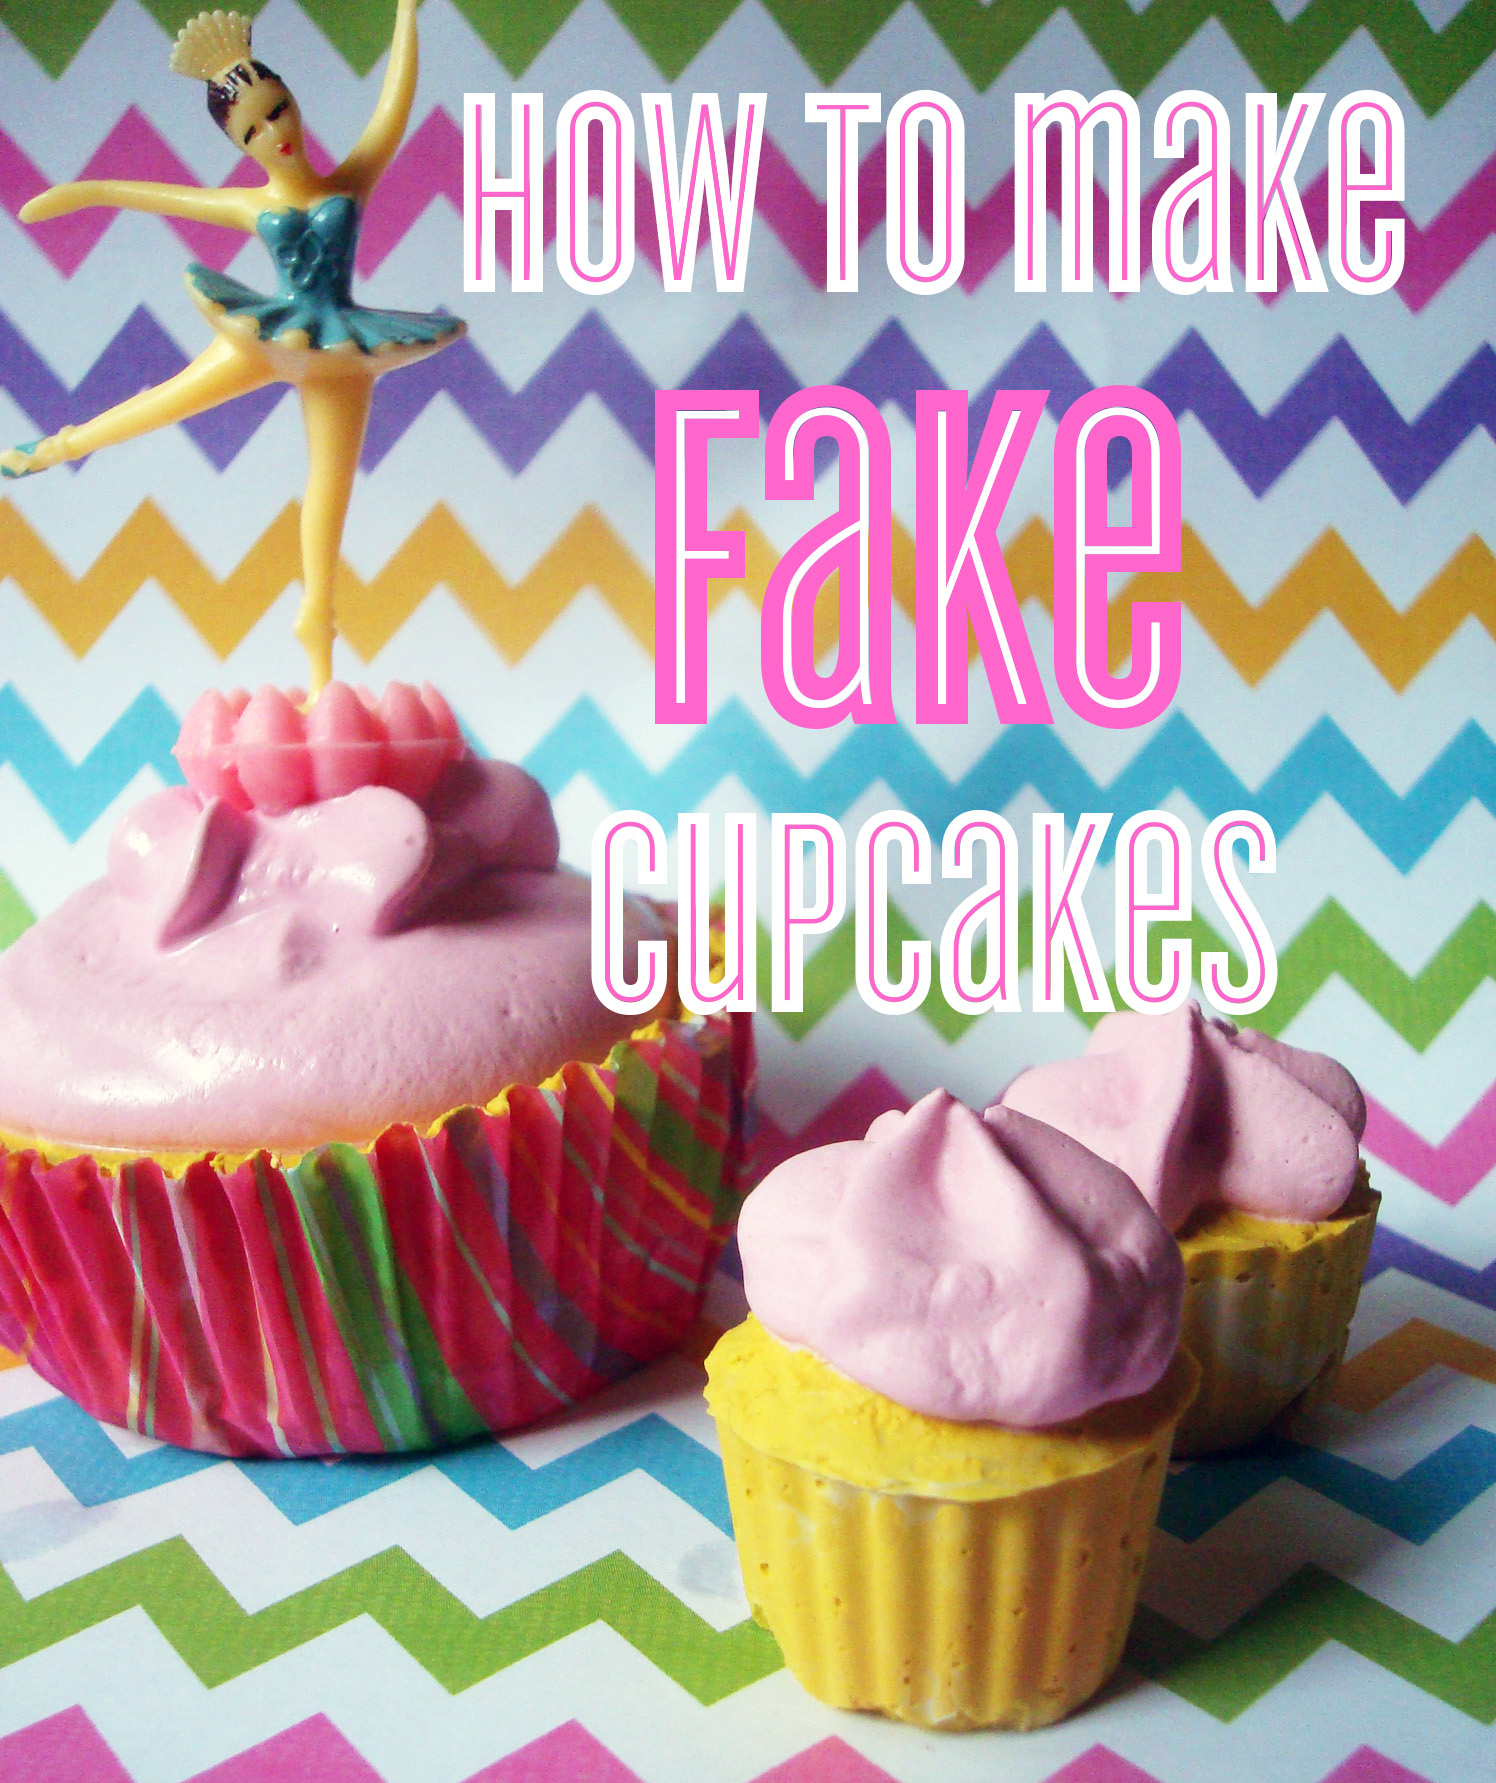 Fake cupcakes tutorial